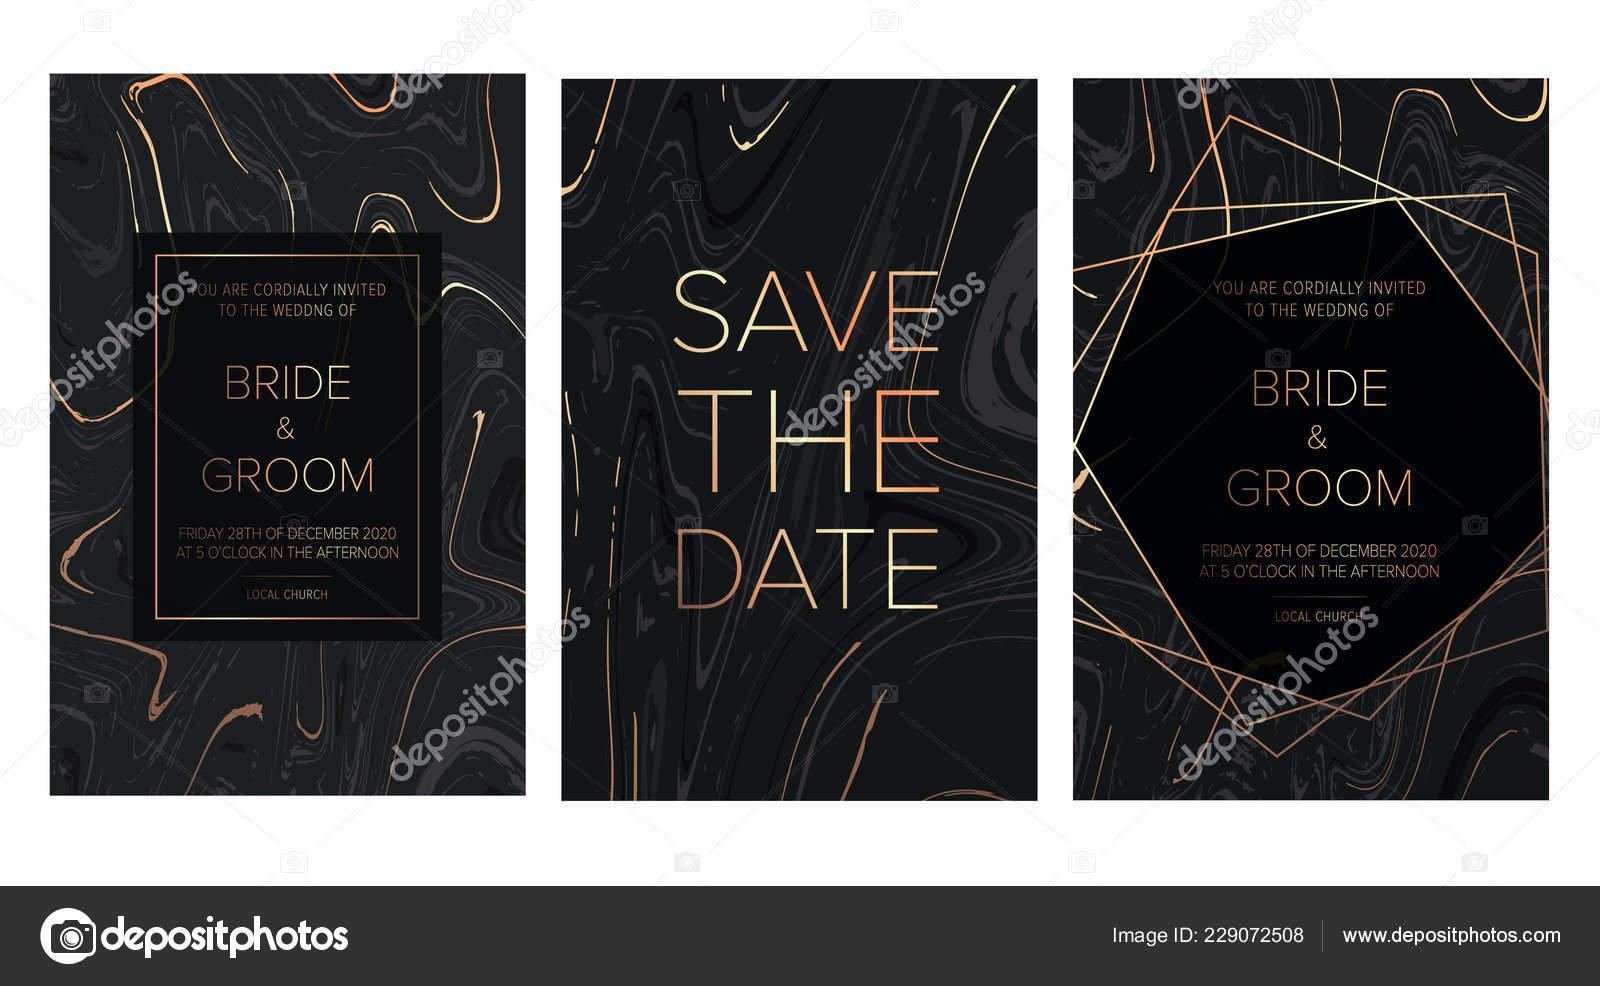 Luxury Wedding Invitation Cards Black Gold Marble Texture